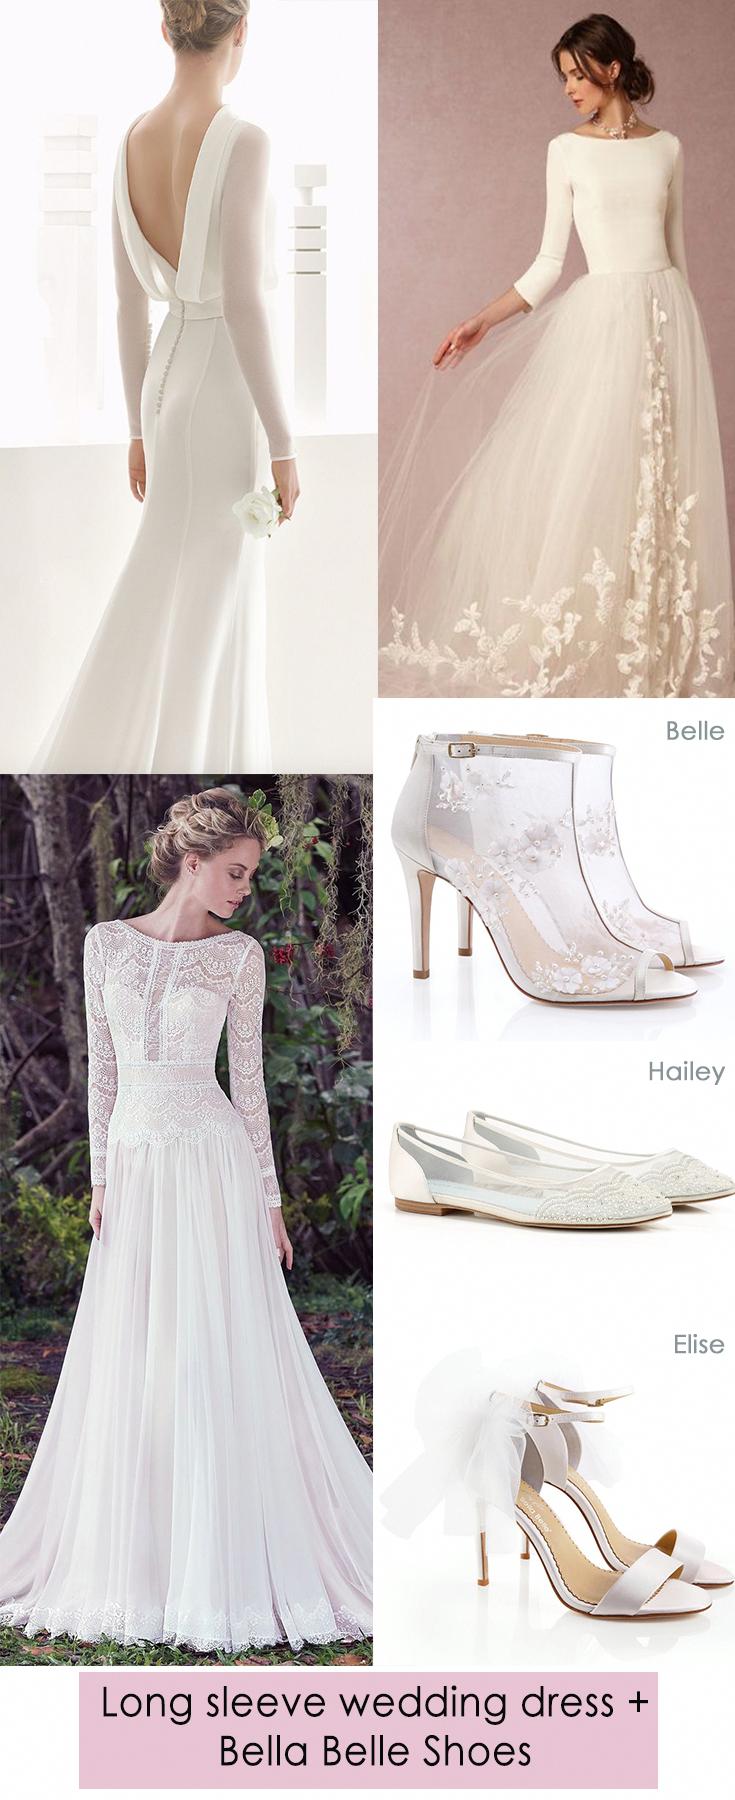 White Lace Backless Elegant And Vintage Long Sleeve Wedding